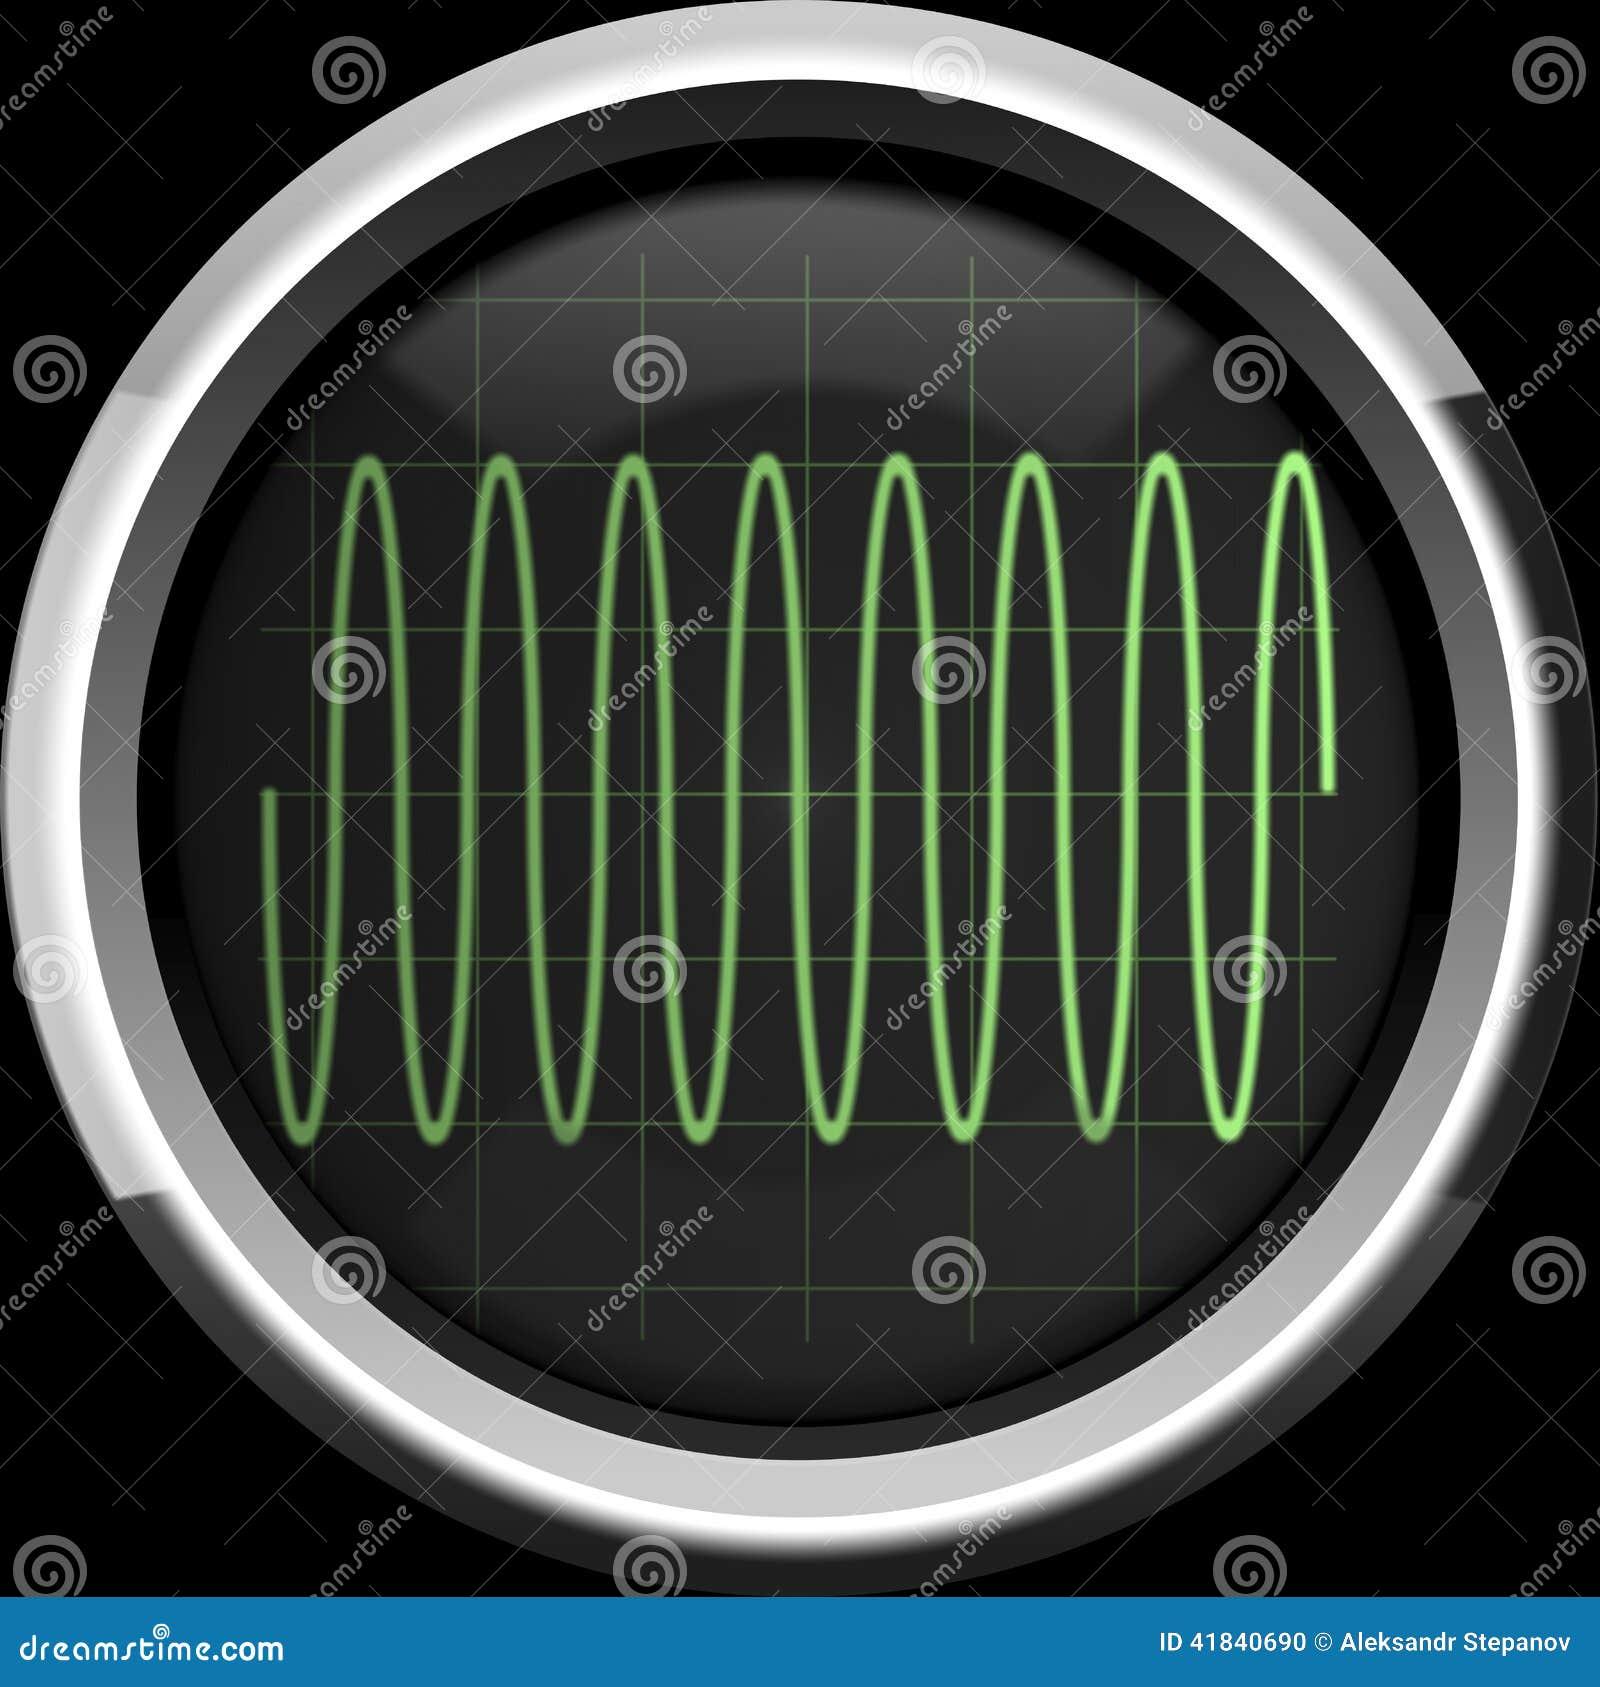 how to read an oscilloscope screen